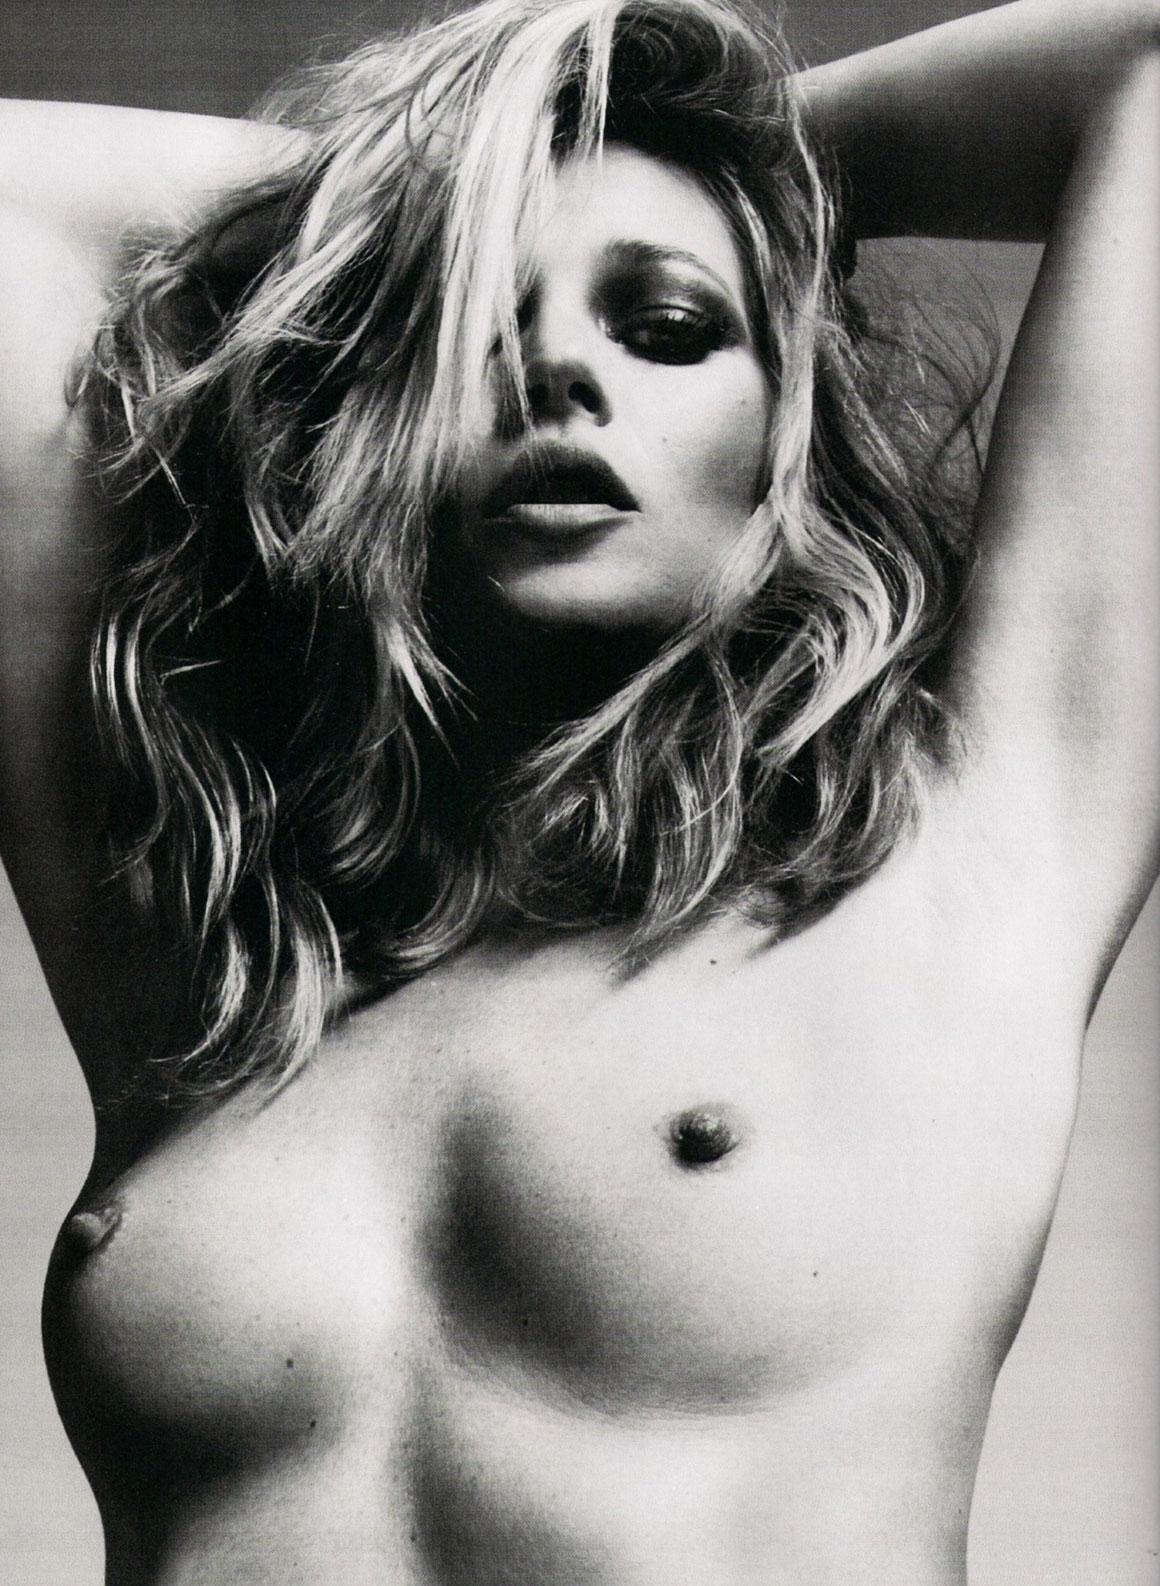 http://1.bp.blogspot.com/-zPtEzOHnzpU/T0_yn8HUePI/AAAAAAAAP8g/GDq-S8C_R4Y/s1600/sciencextra.fr-Kate+Moss+pose+seins+nus+pour+la+Fashion+Week+Parisienne.jpg